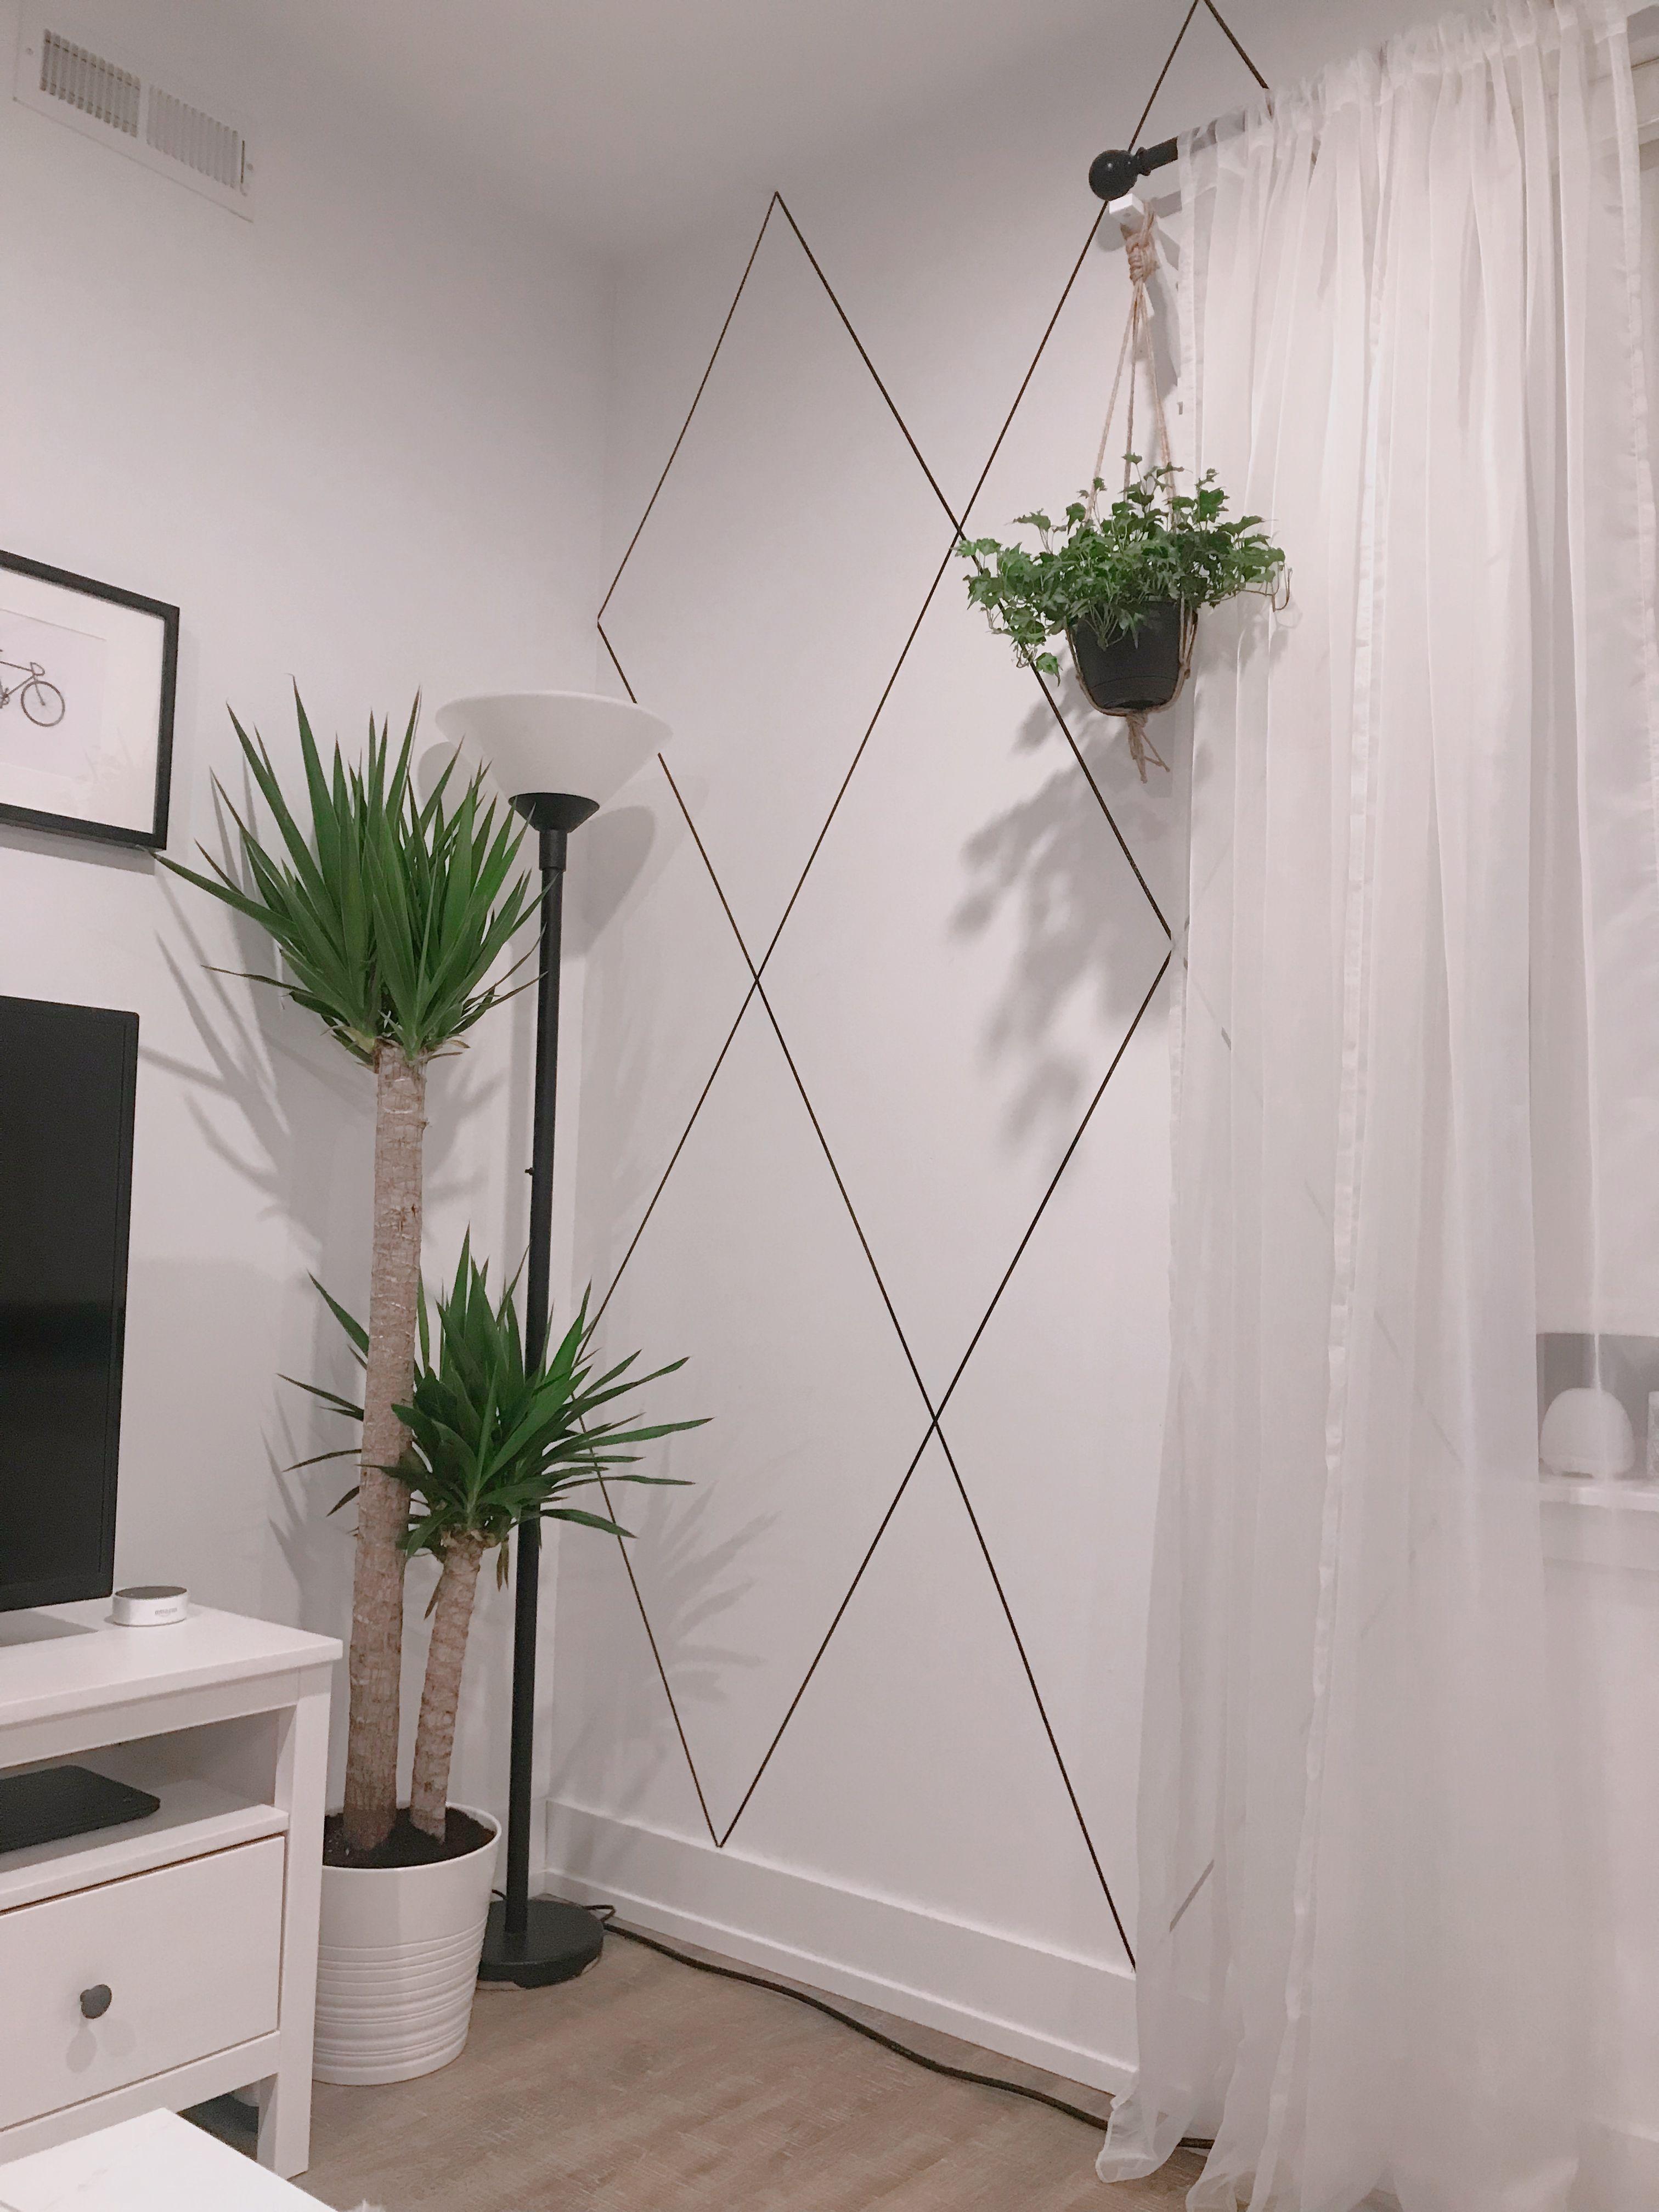 Amazon Com Washi Tape For Walls Washi Tape Set Of Cute